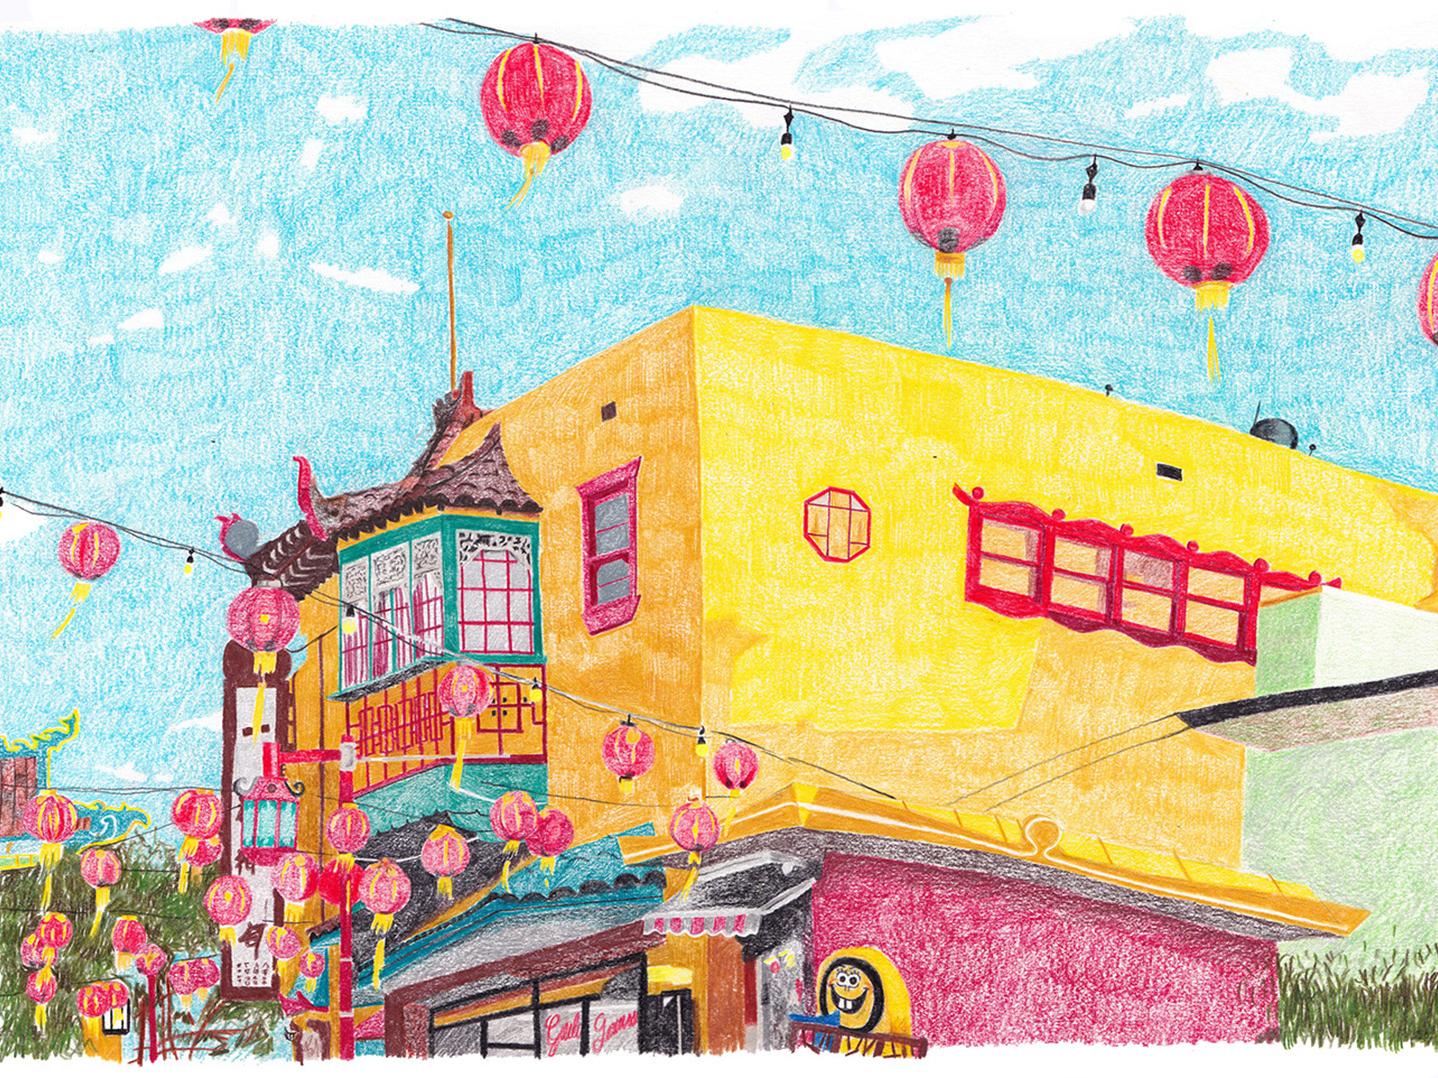 Chinatown art drawing illustration